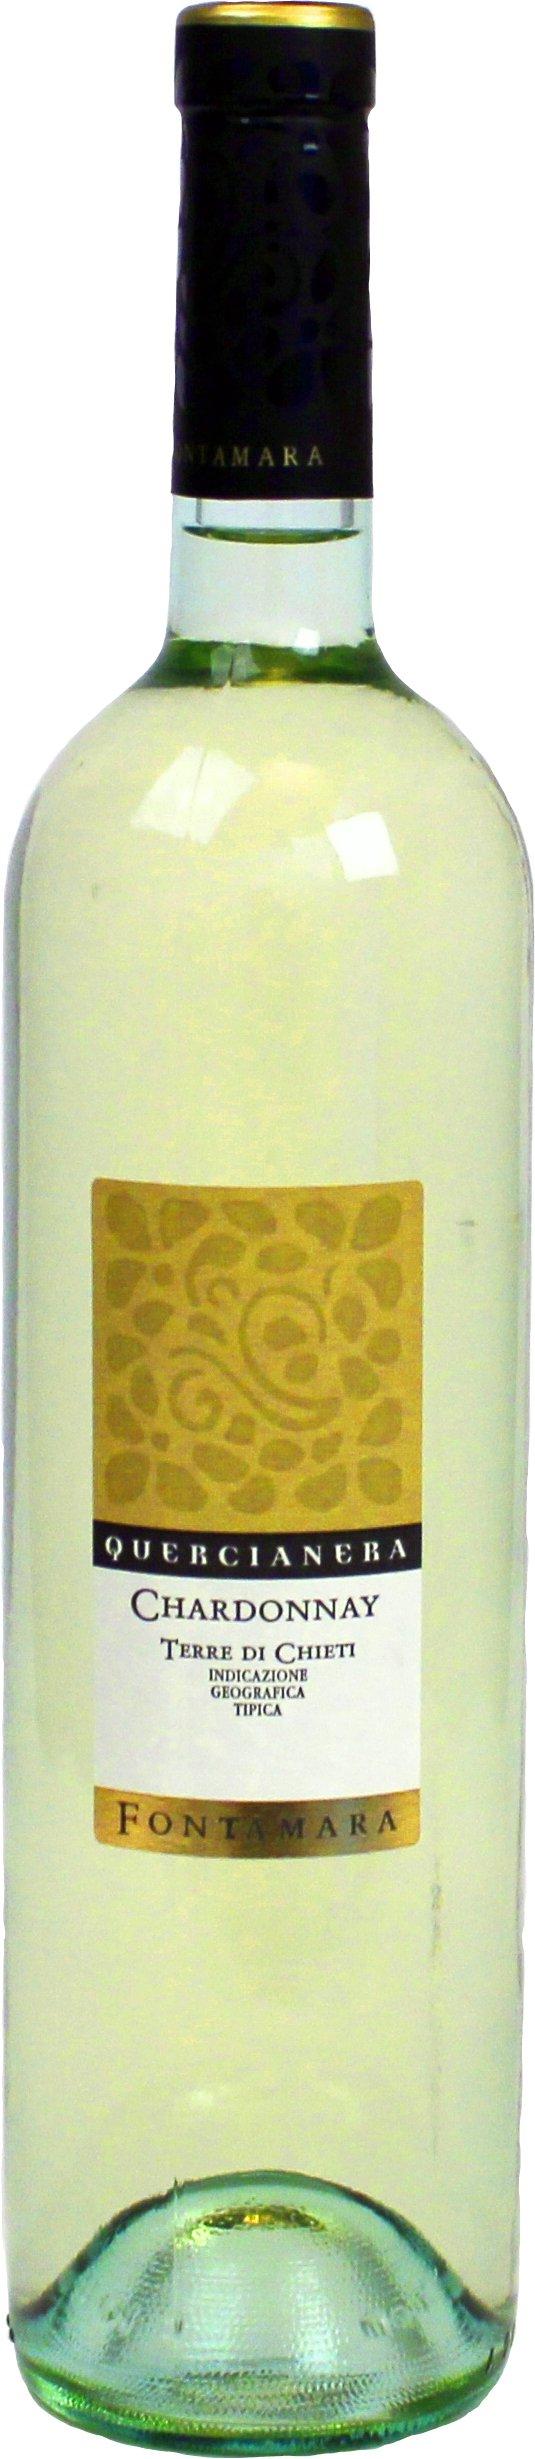 6x-075l-2017er-Quercianera-Chardonnay-Terre-di-Chieti-IGT-Abruzzen-Italien-Weiwein-trocken